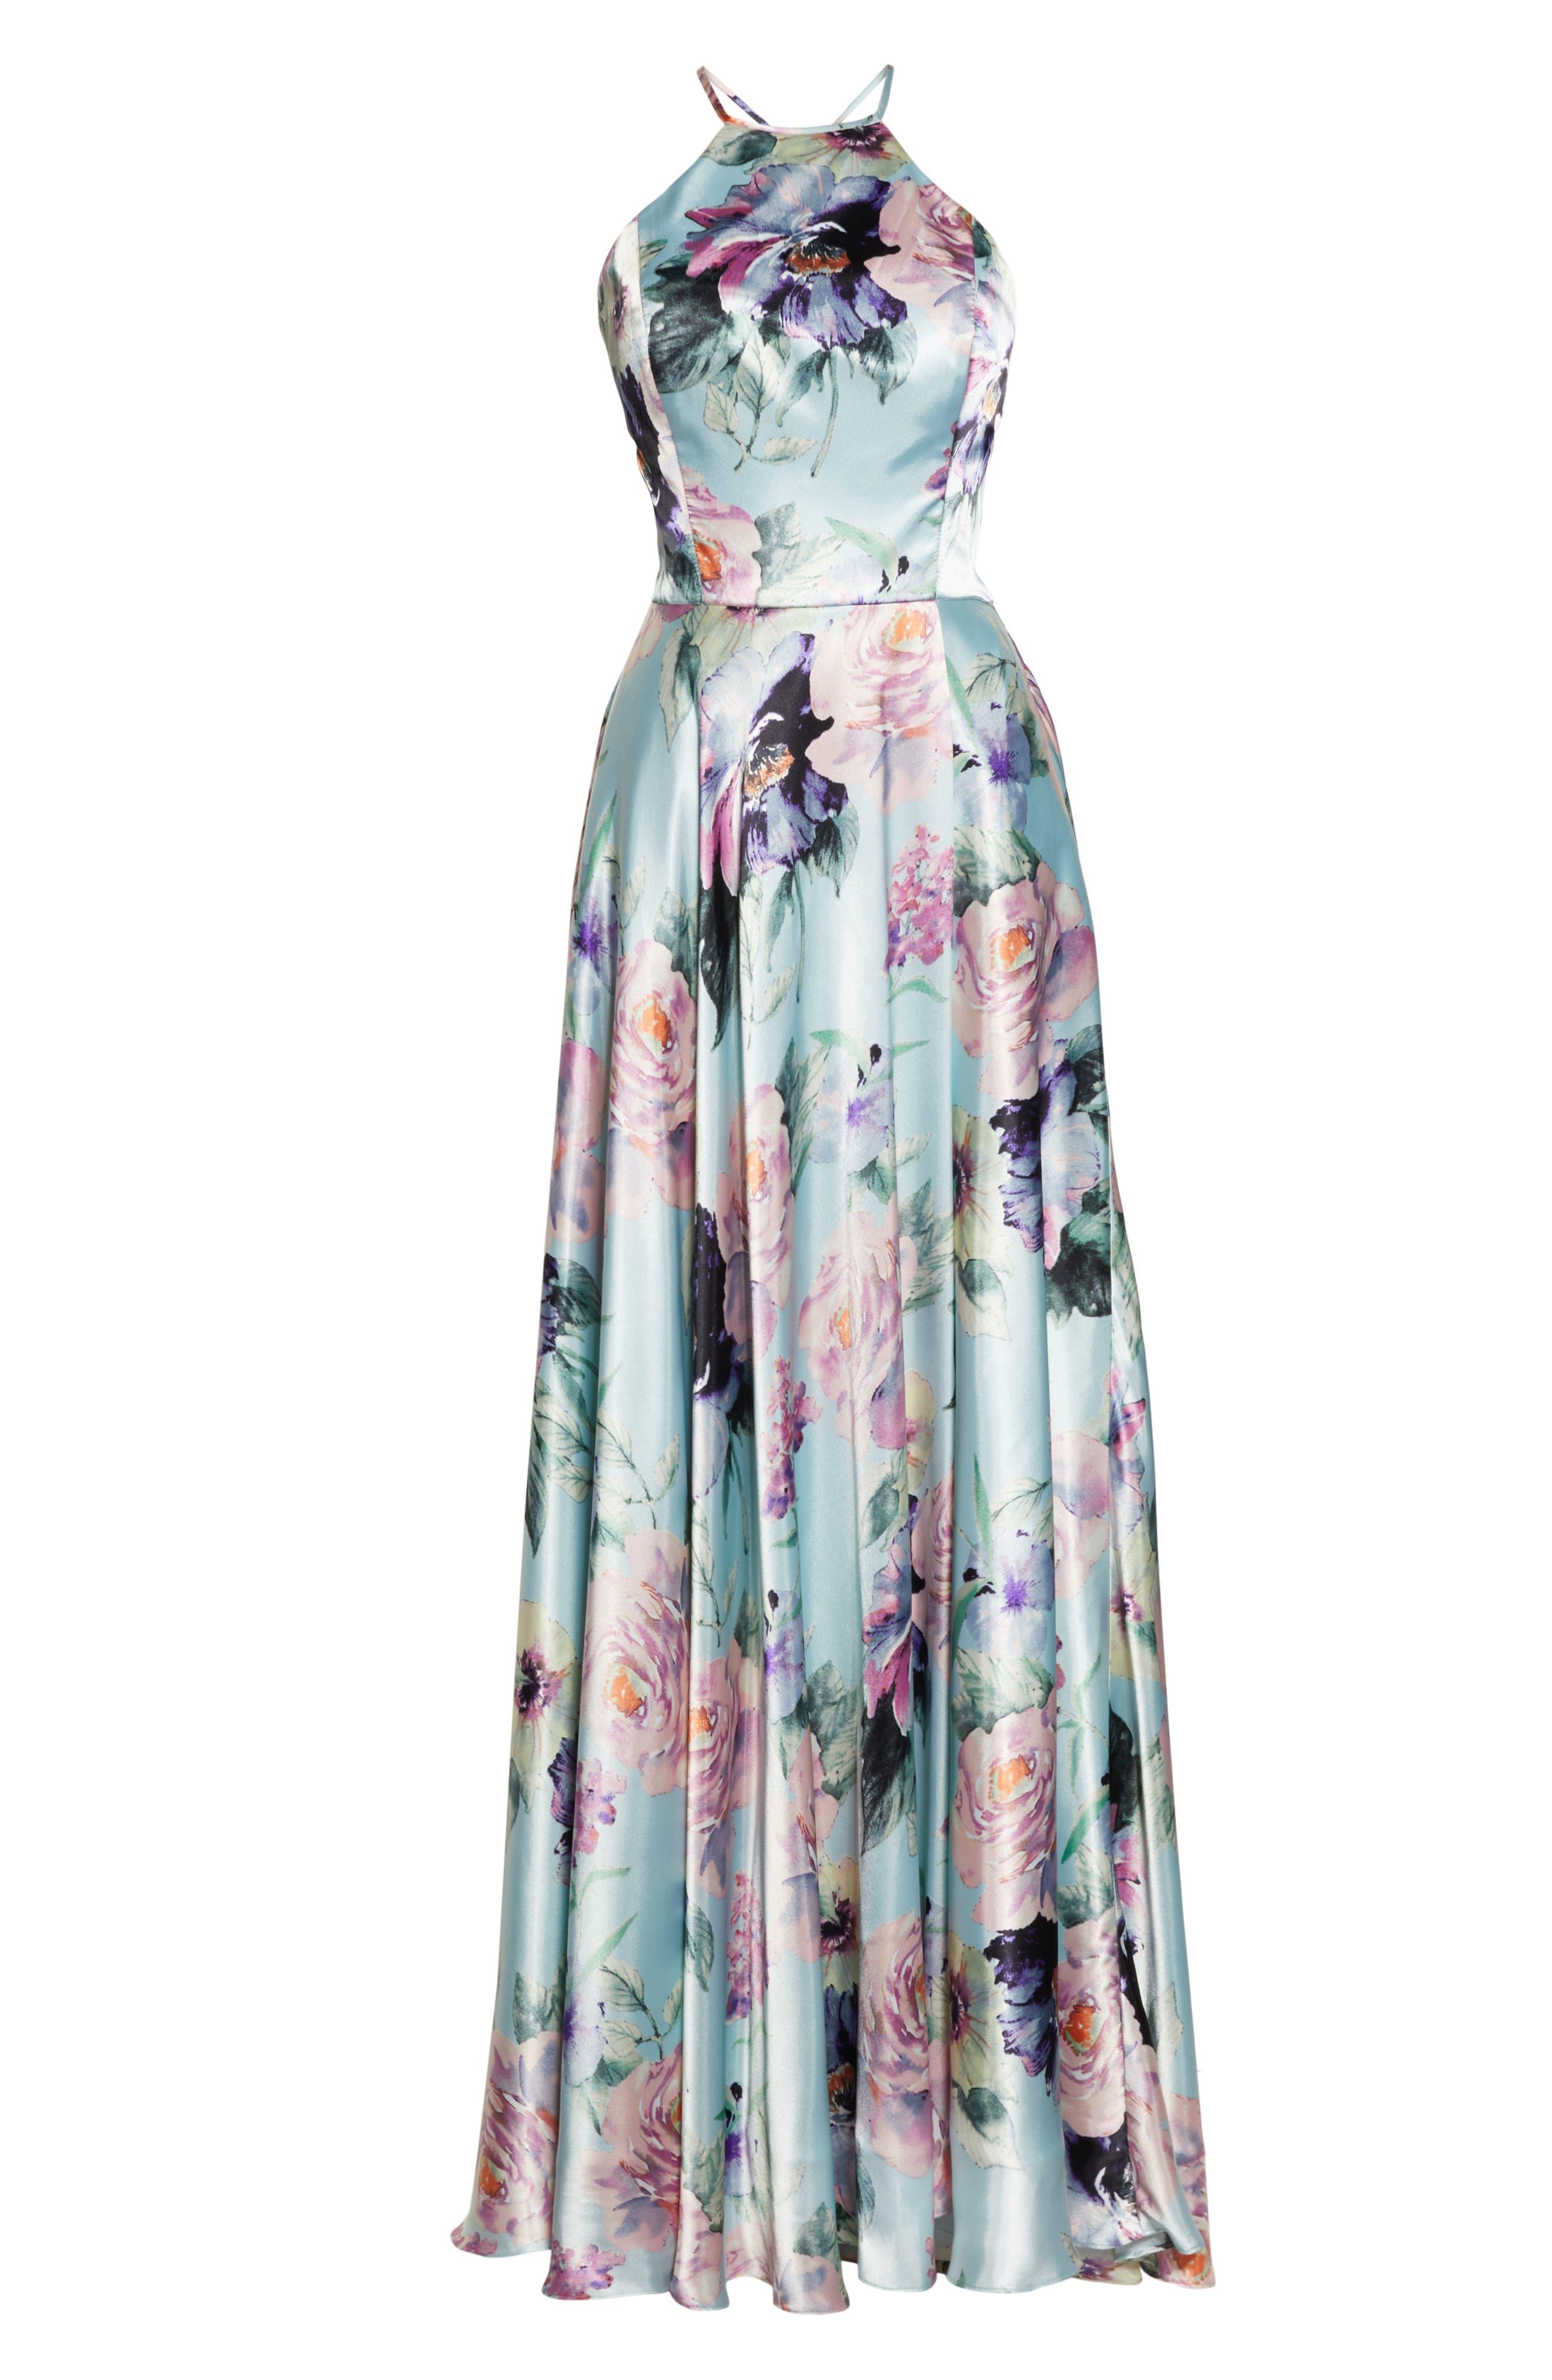 BLONDIE NITES,                             Floral Print Charmeuse Evening Dress,                             Alternate thumbnail 7, color,                             MINT/ MULTI